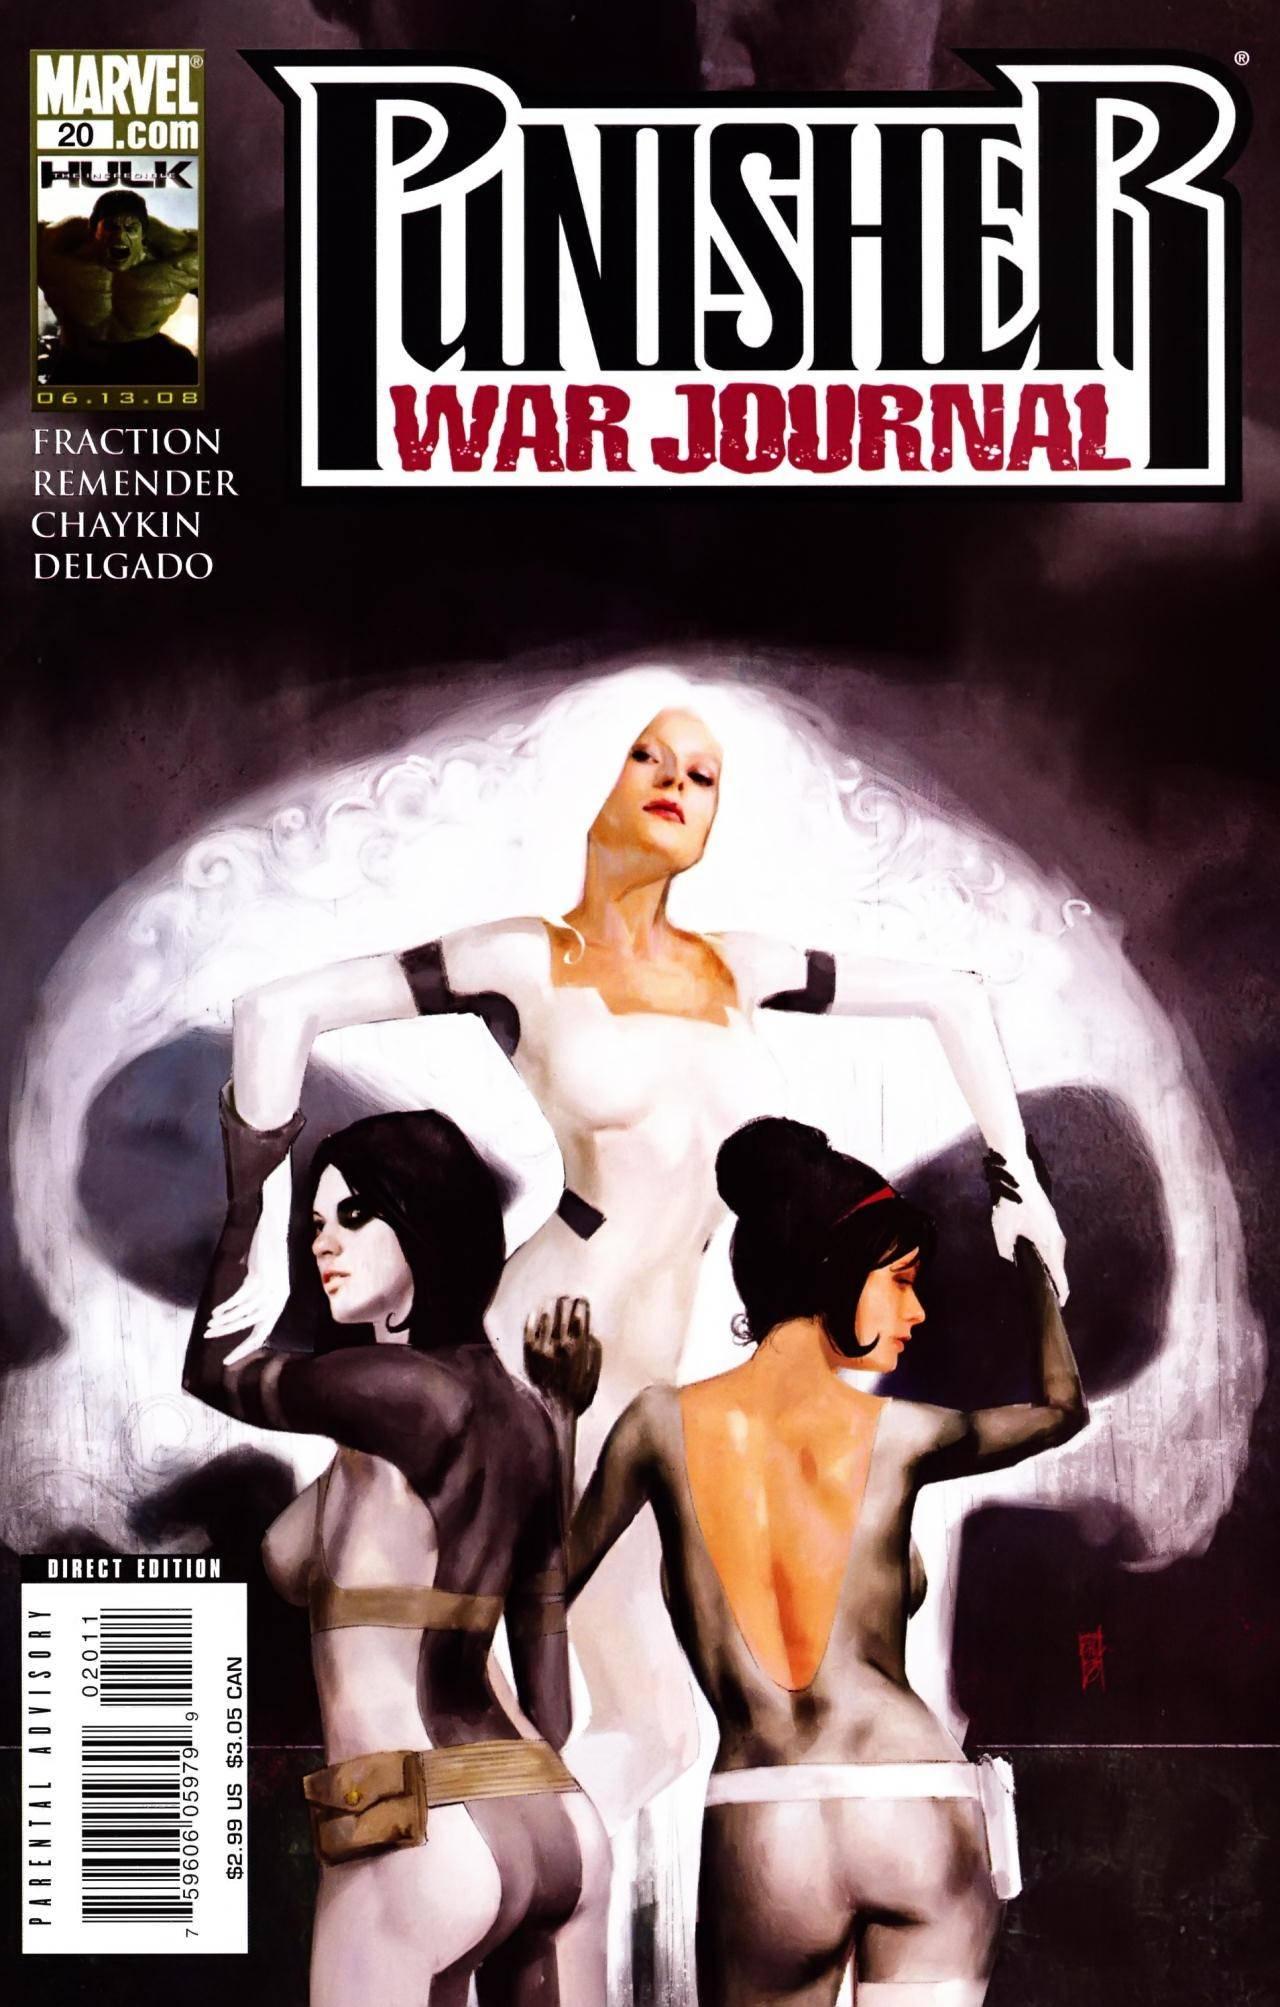 For PostalPops in case you want it all- Punisher War Journal v2 020 2008 cbr